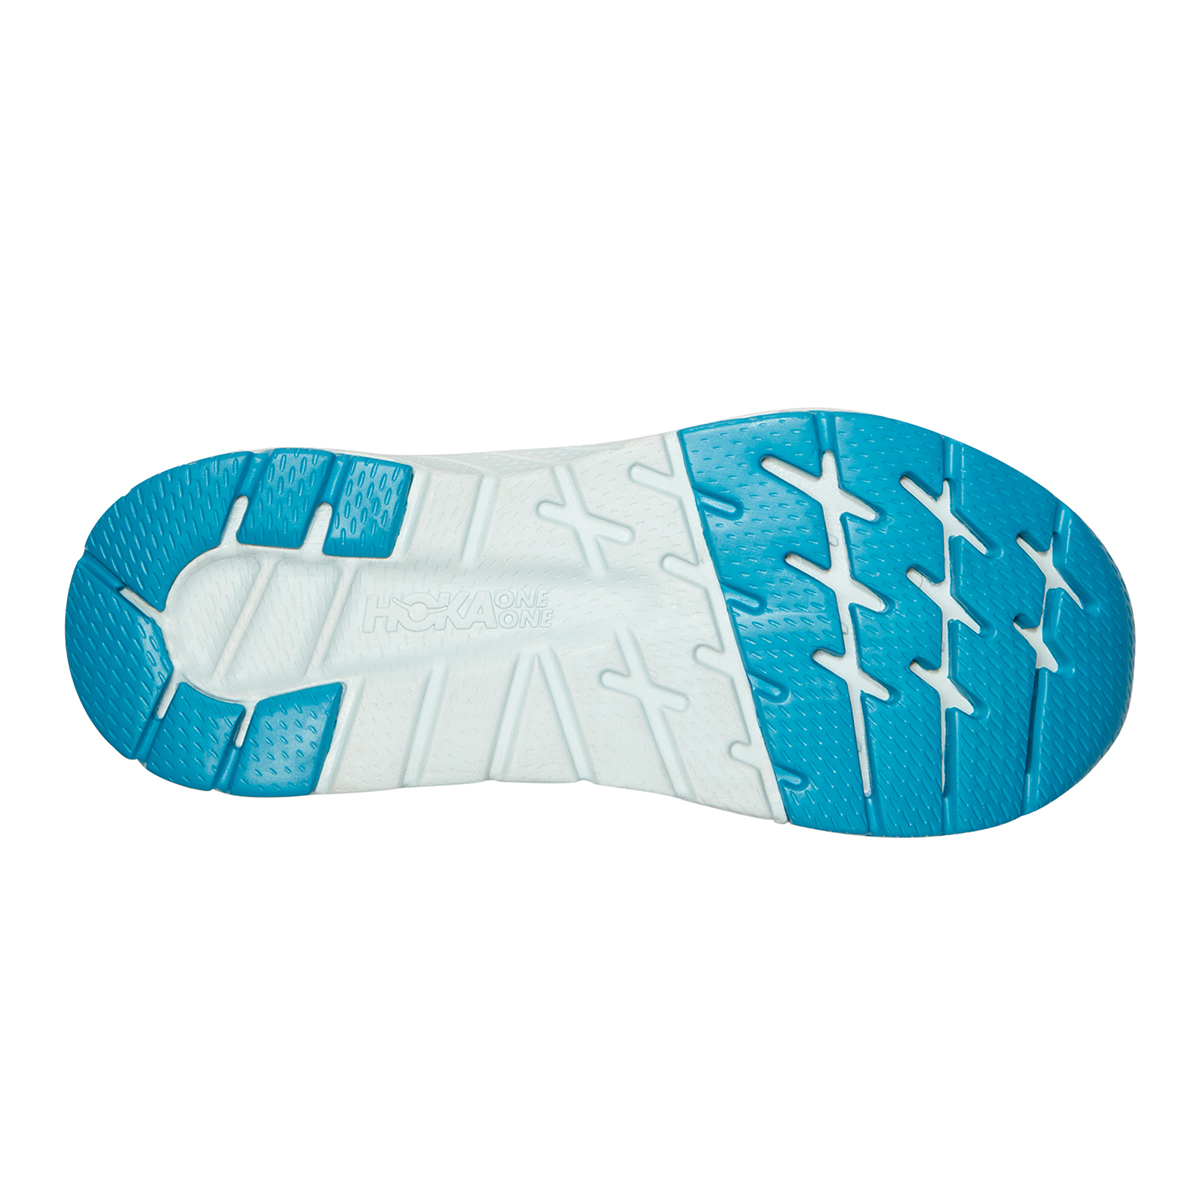 Women's Hoka One One Cavu 3 Running Shoe - Color: Stellar  - Size: 5 - Width: Regular, Stellar, large, image 4